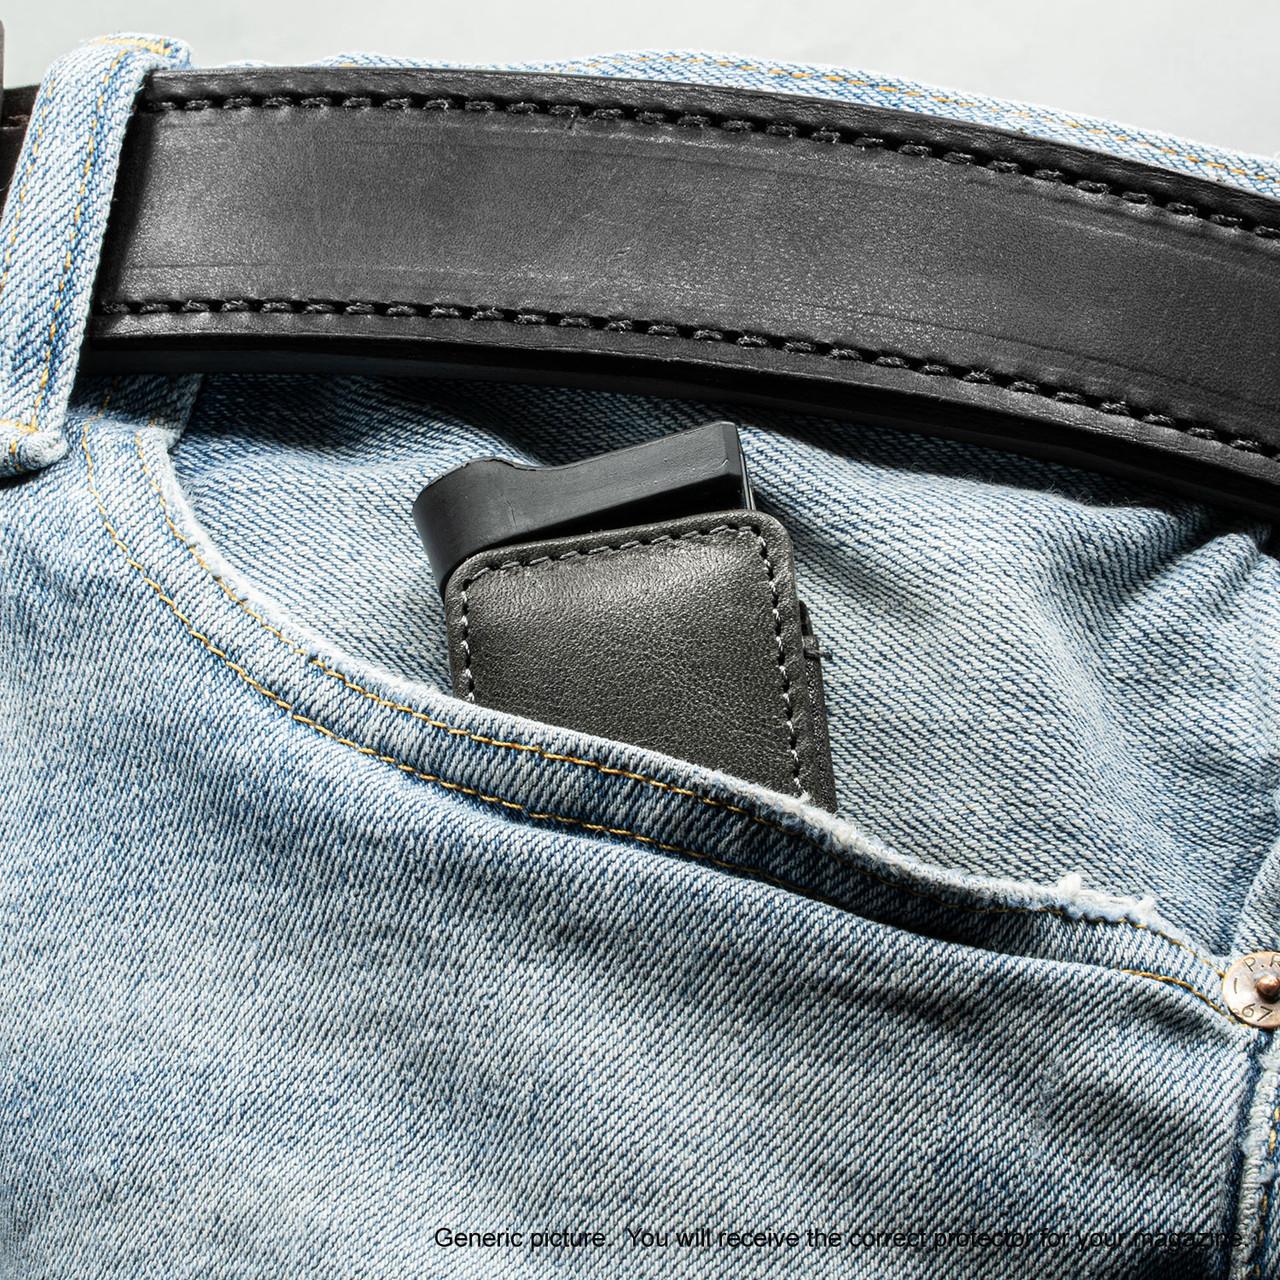 Kahr S9 Black Freedom Magazine Pocket Protector